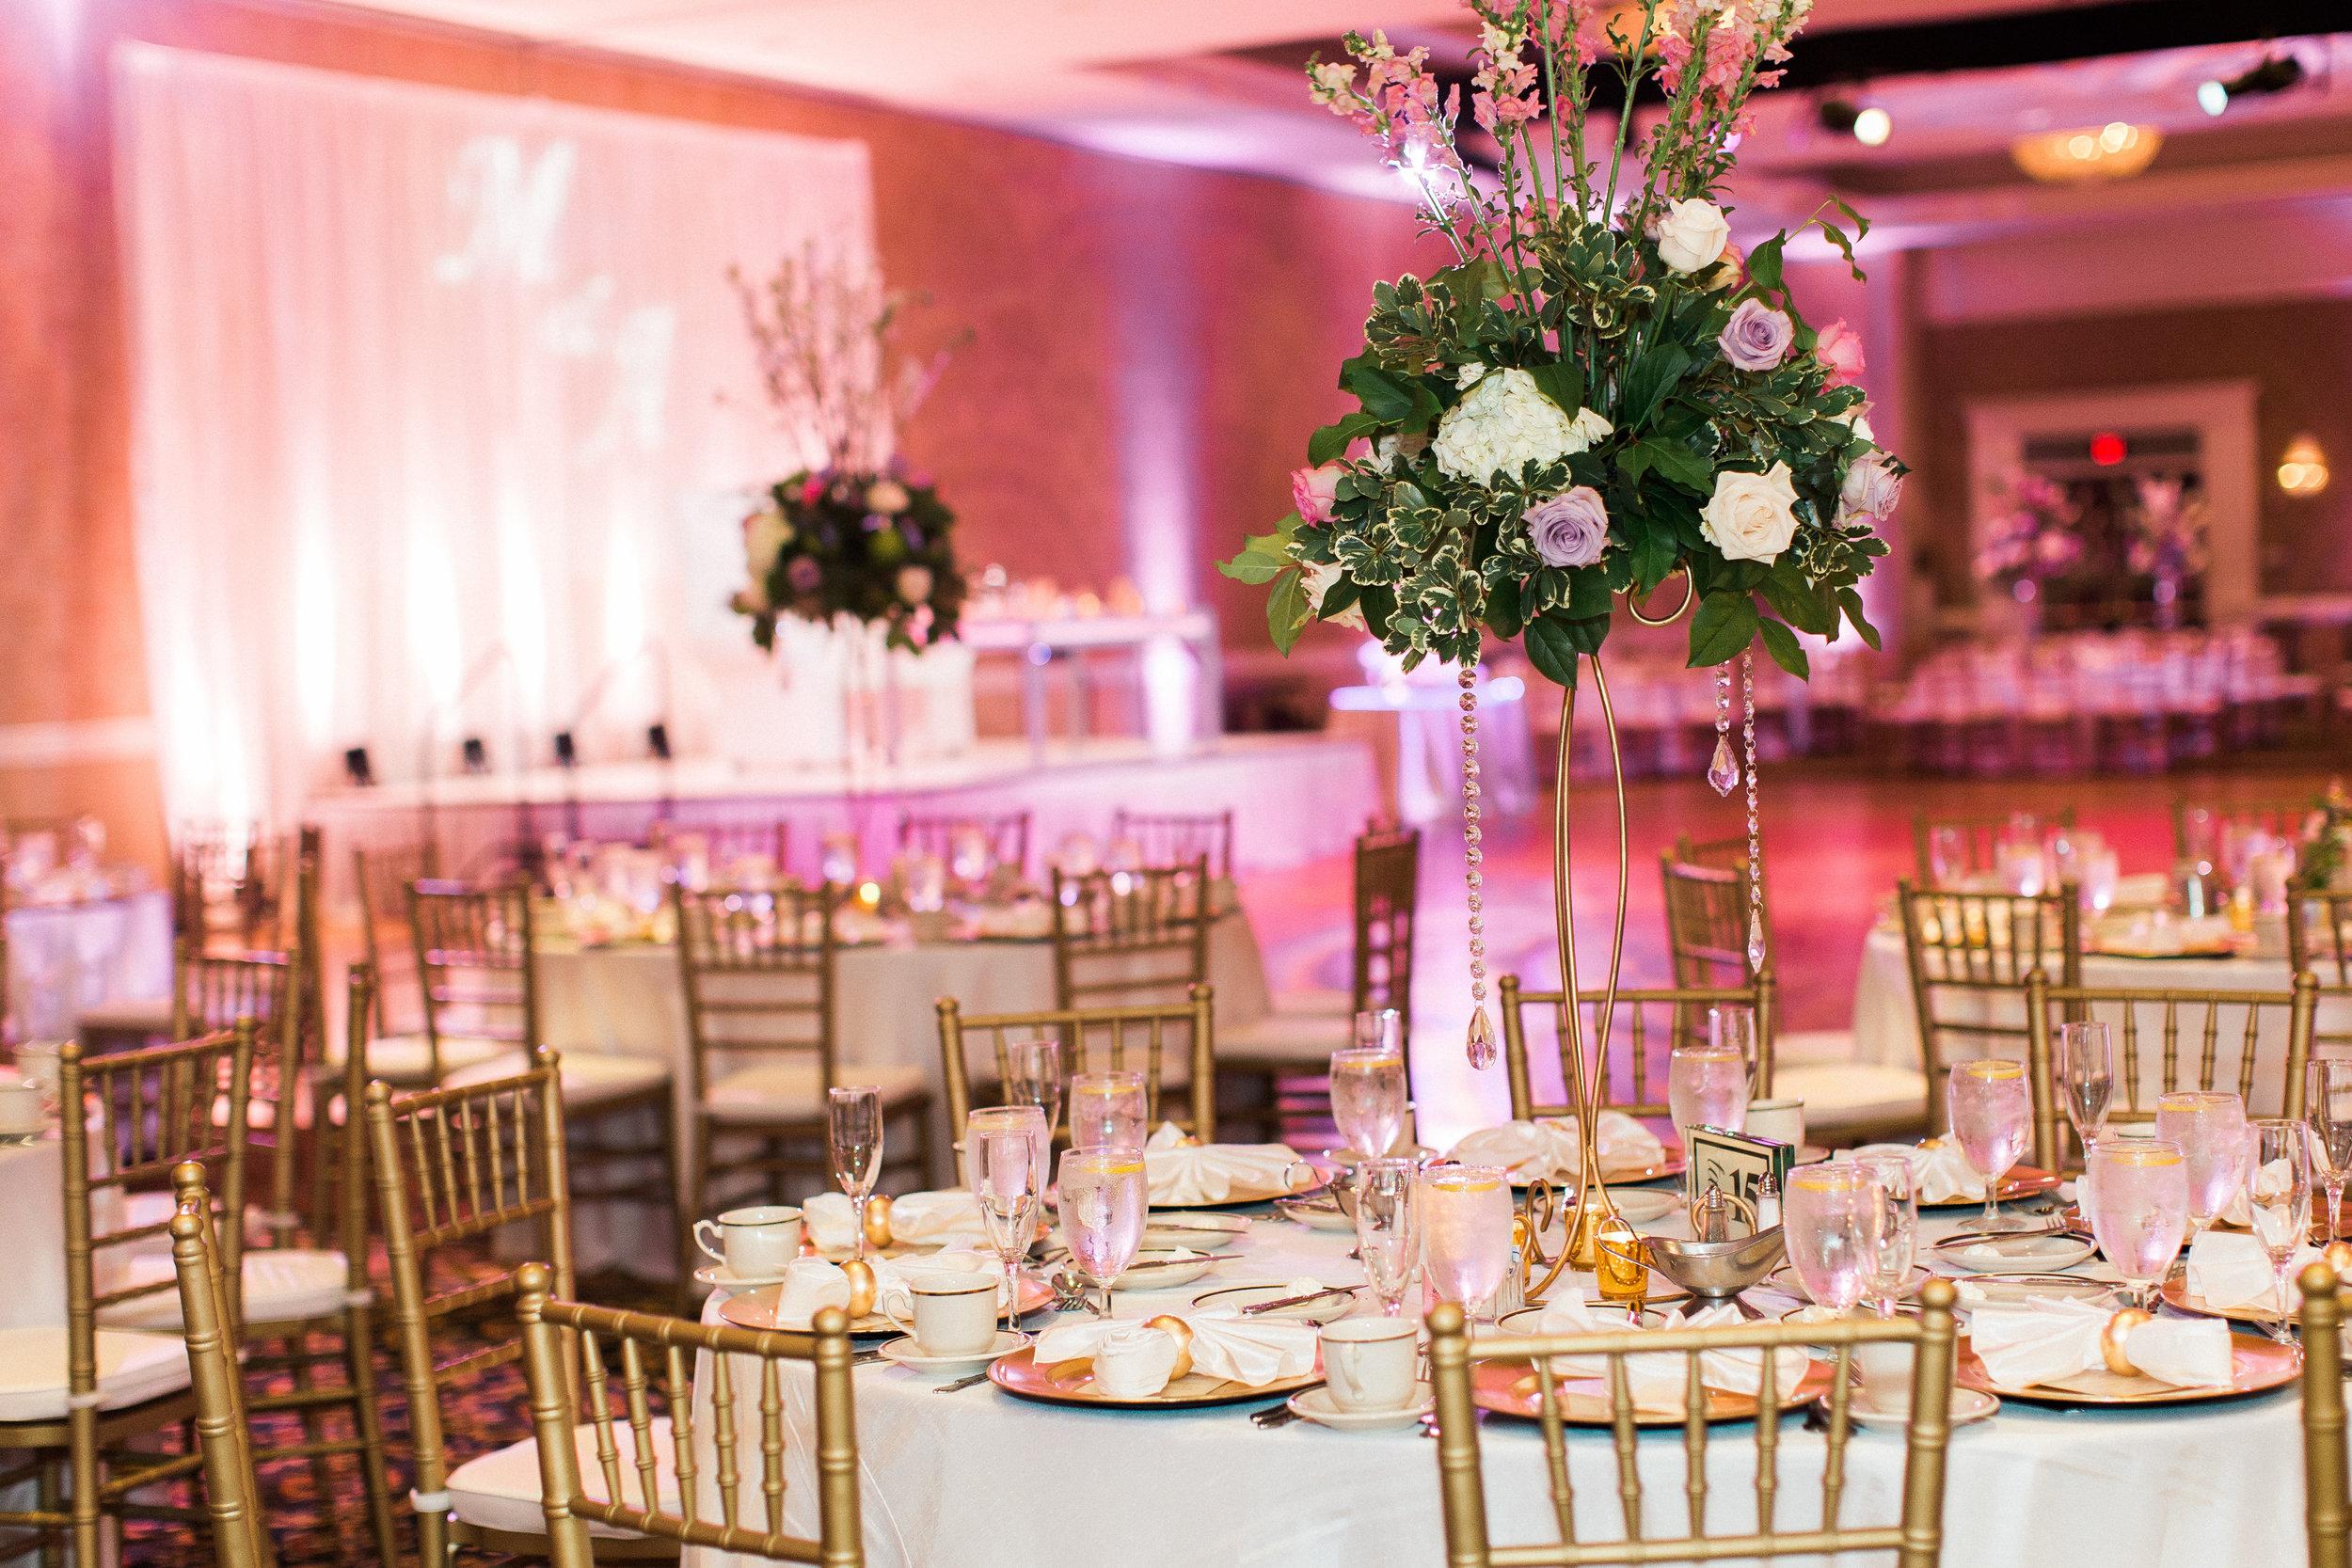 alex-and-malika-wedding-reception-0024.jpg